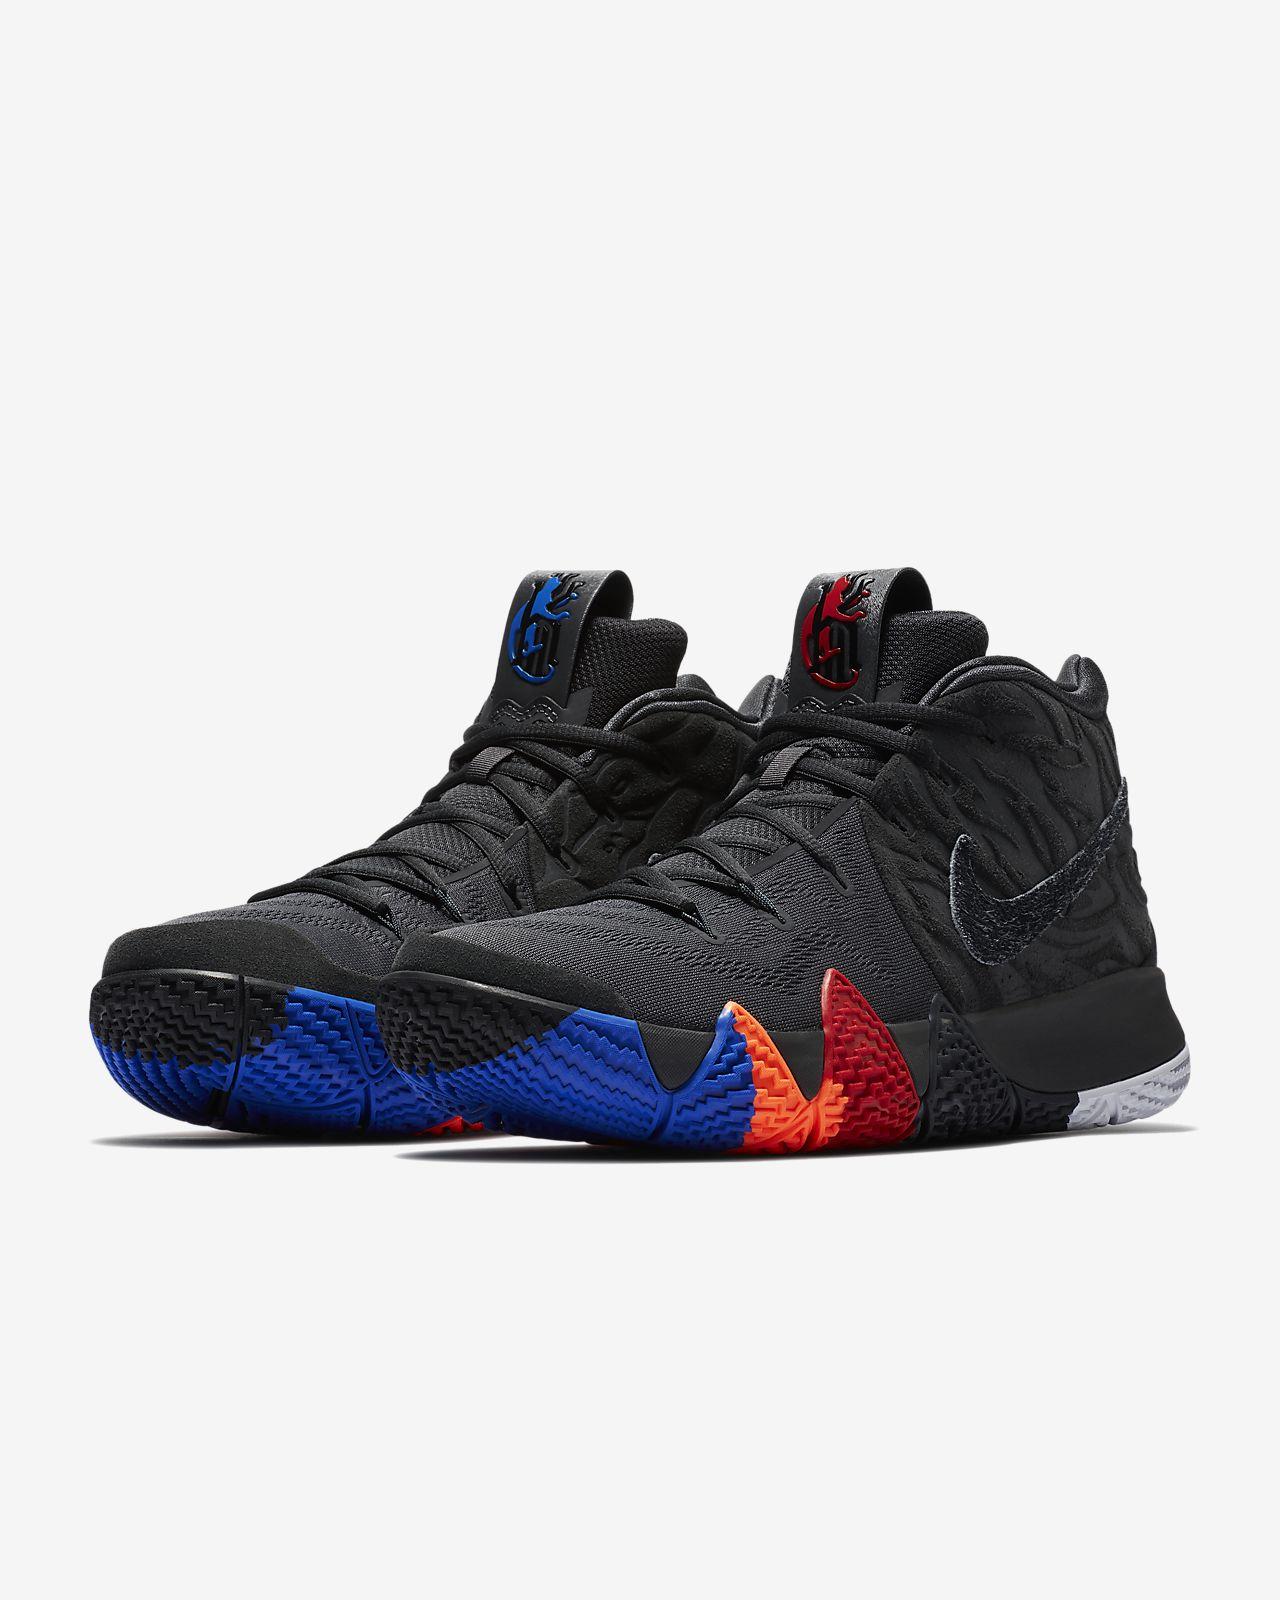 71f4ae5f7833 Low Resolution Kyrie 4 Basketball Shoe Kyrie 4 Basketball Shoe